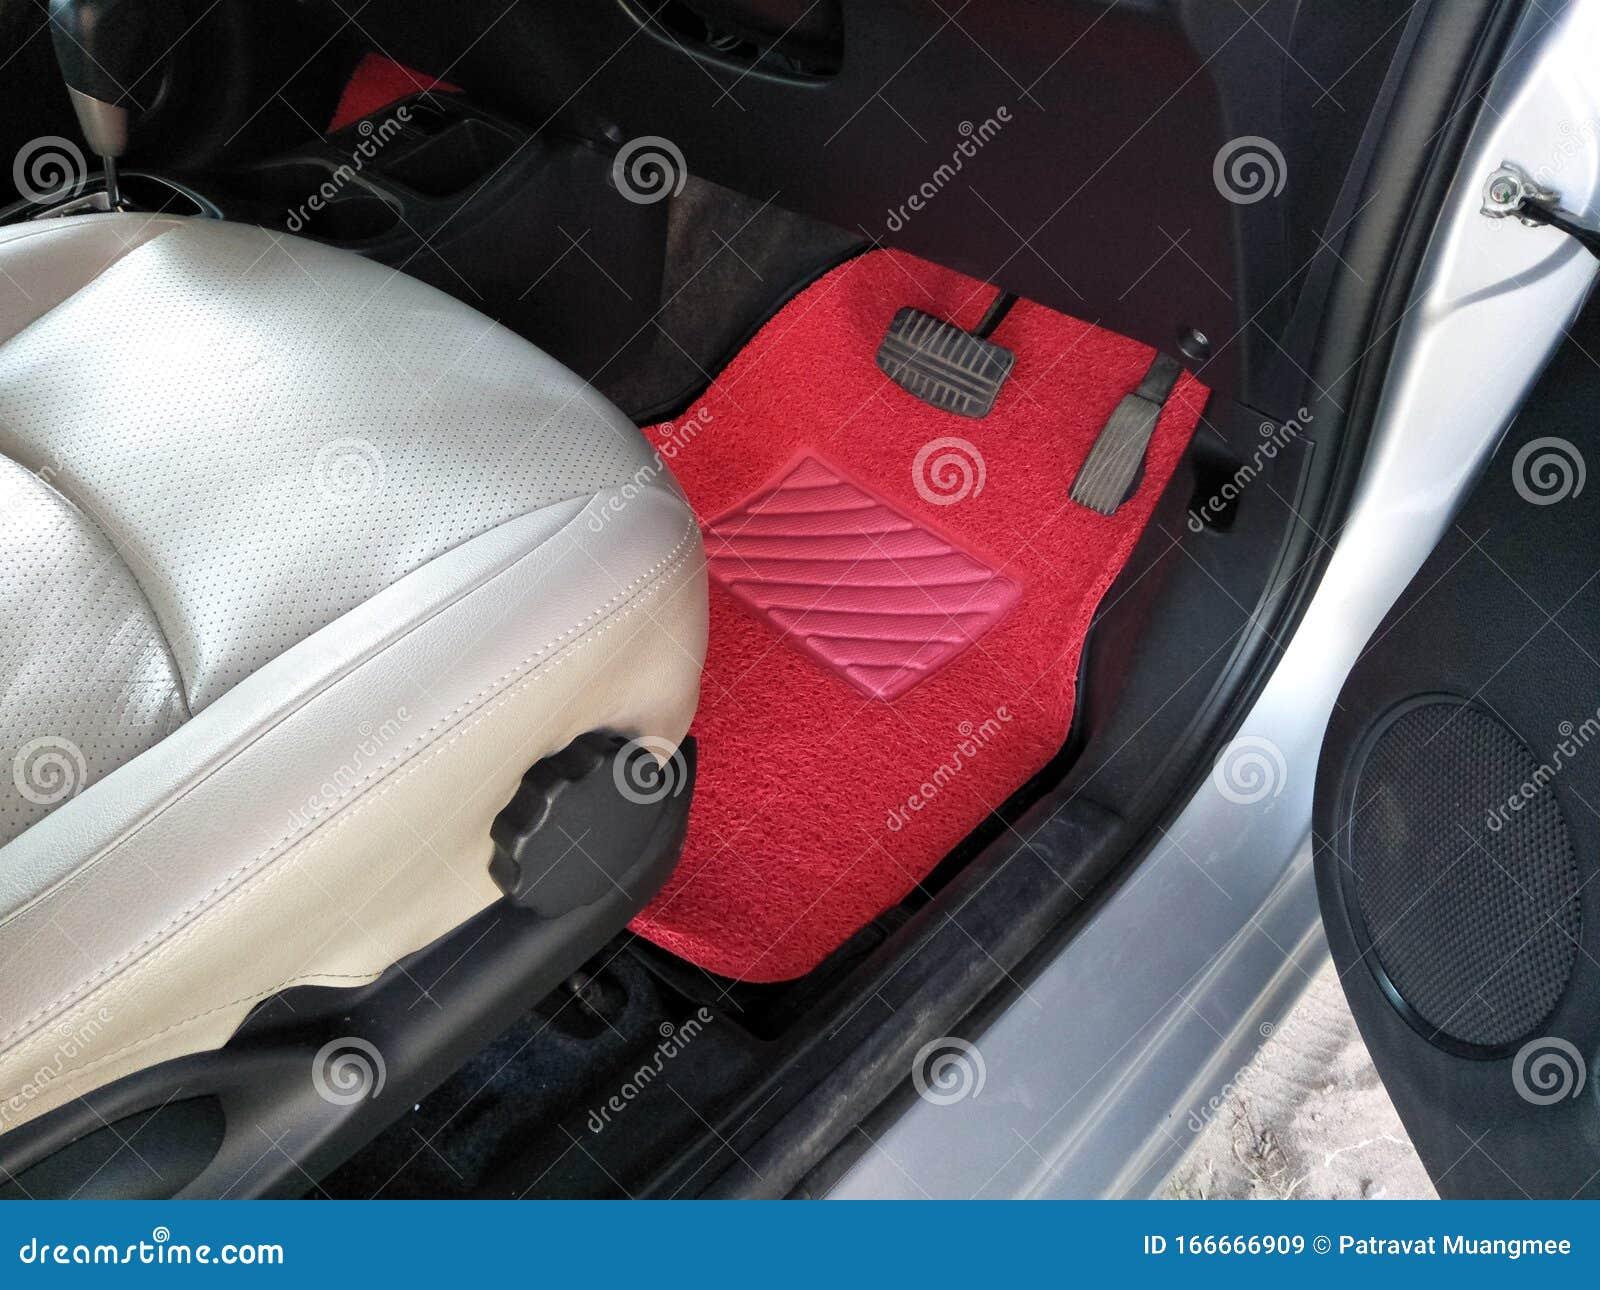 Red Car Floor Mats Placed On Car Floors Inside The Car Stock